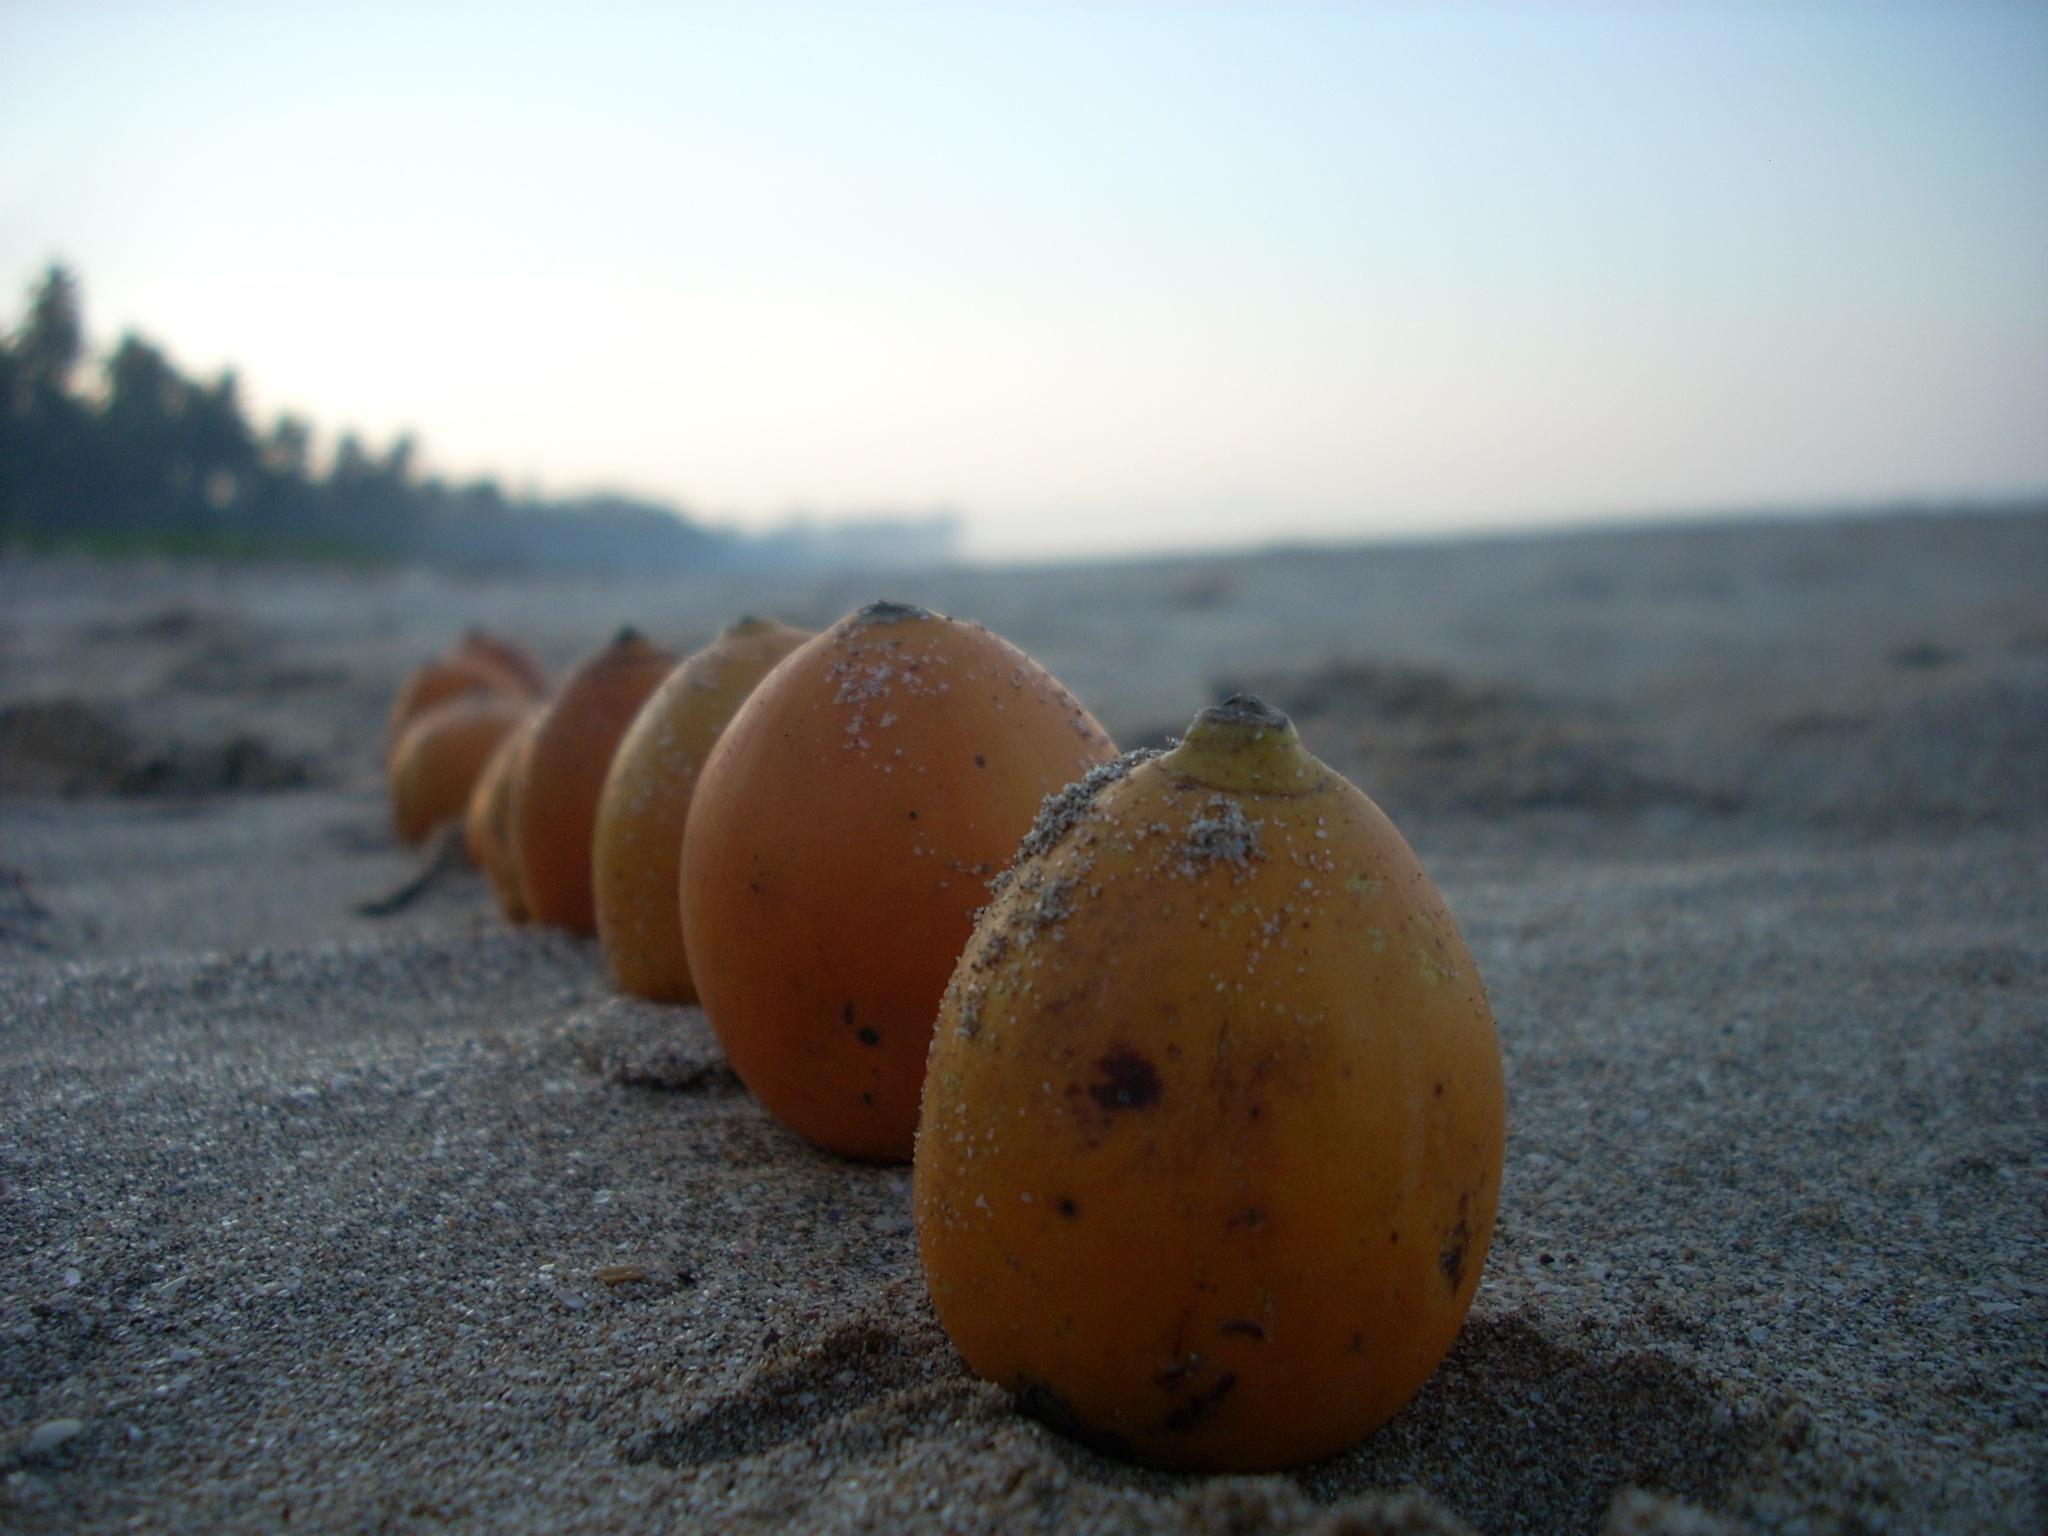 Areca nut by the sea  by Rohan Choudhari